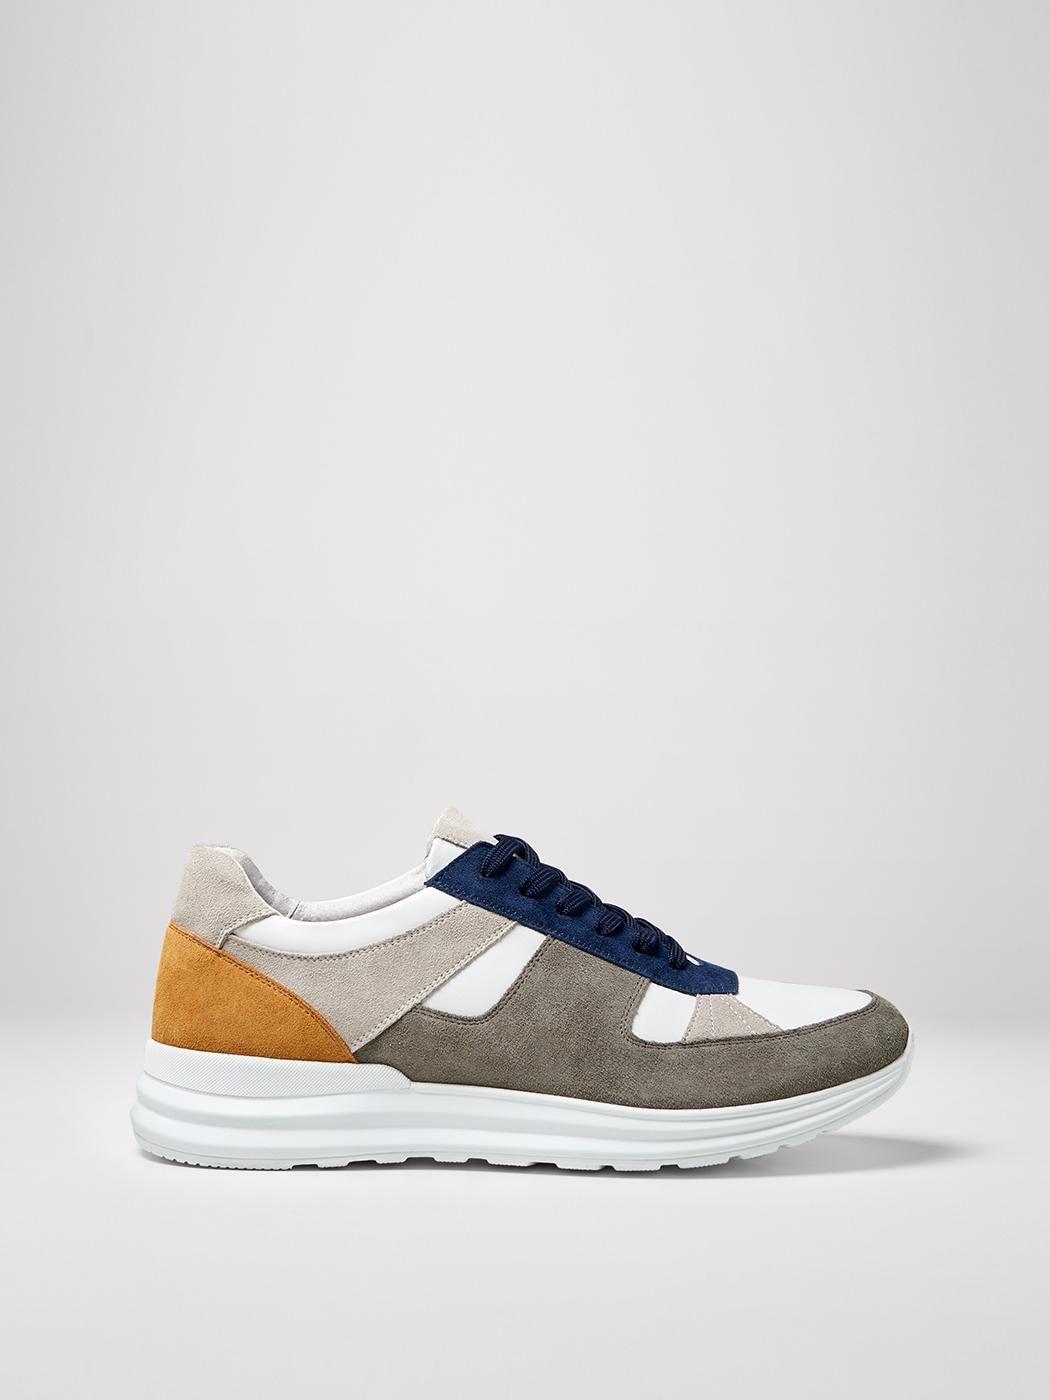 Chaussures ville hommes